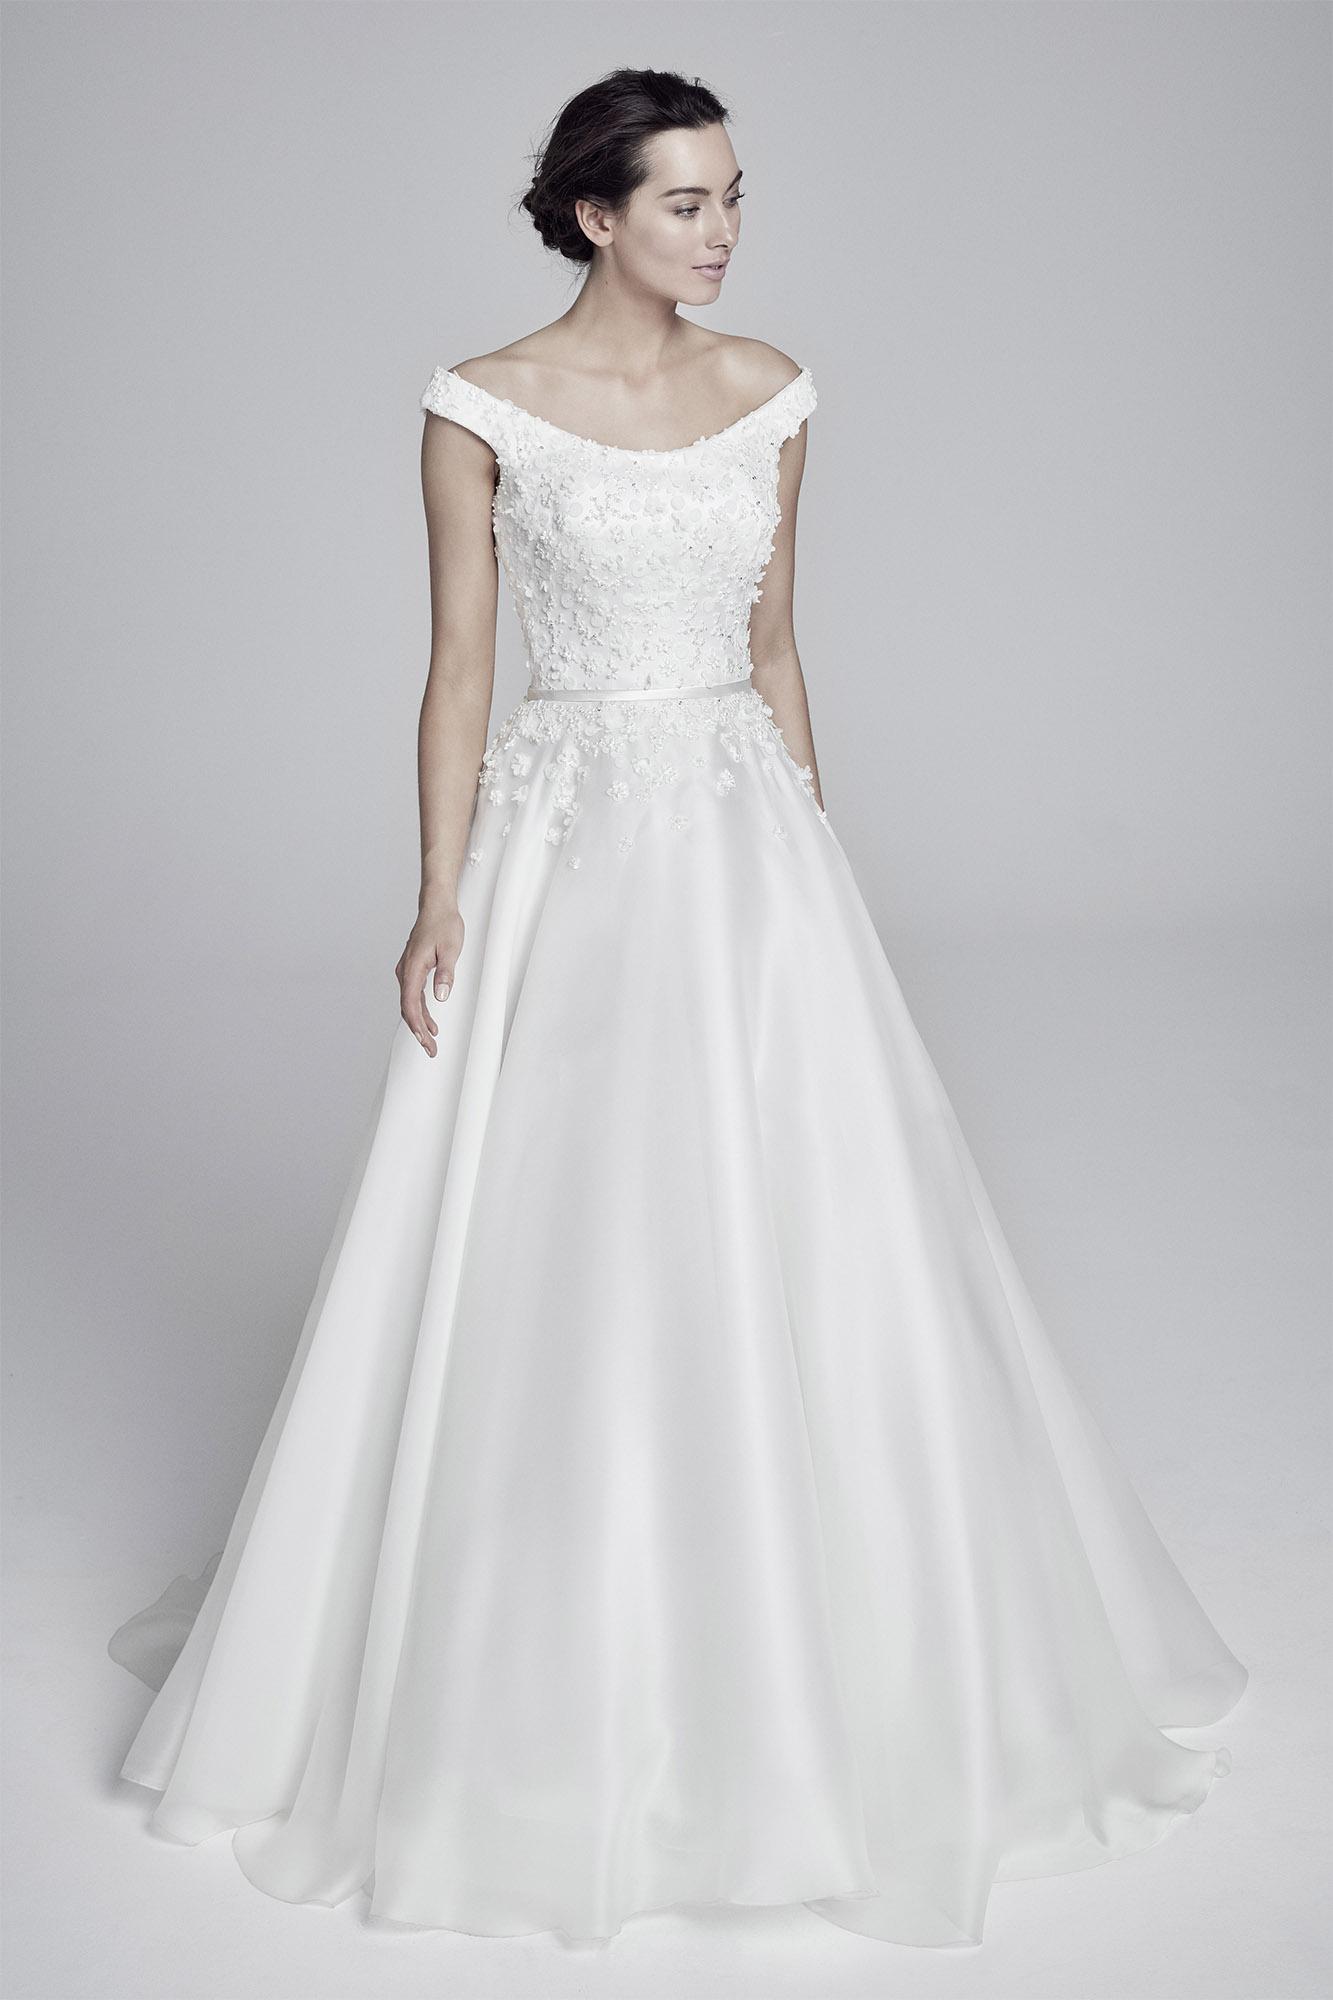 Floriana | Lookbook Collection 2019 | designer wedding dresses by Suzanne Neville